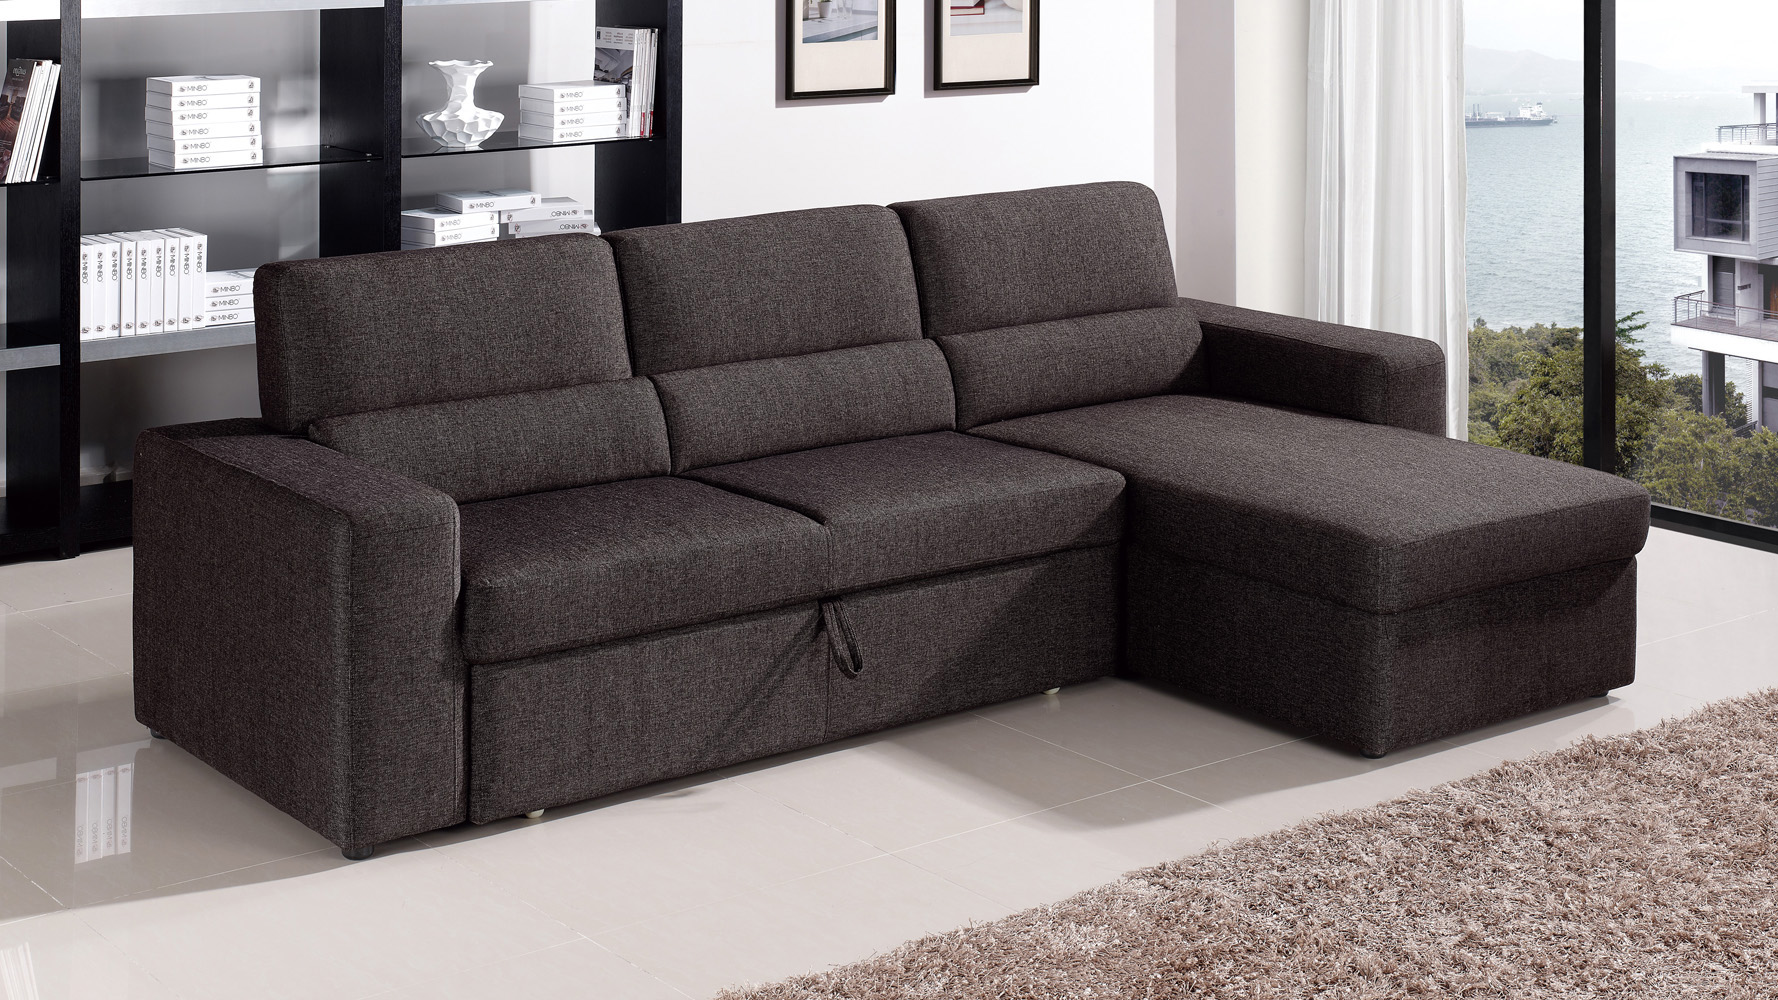 brown sectional sleeper sofa free craigslist nj black clubber zuri furniture